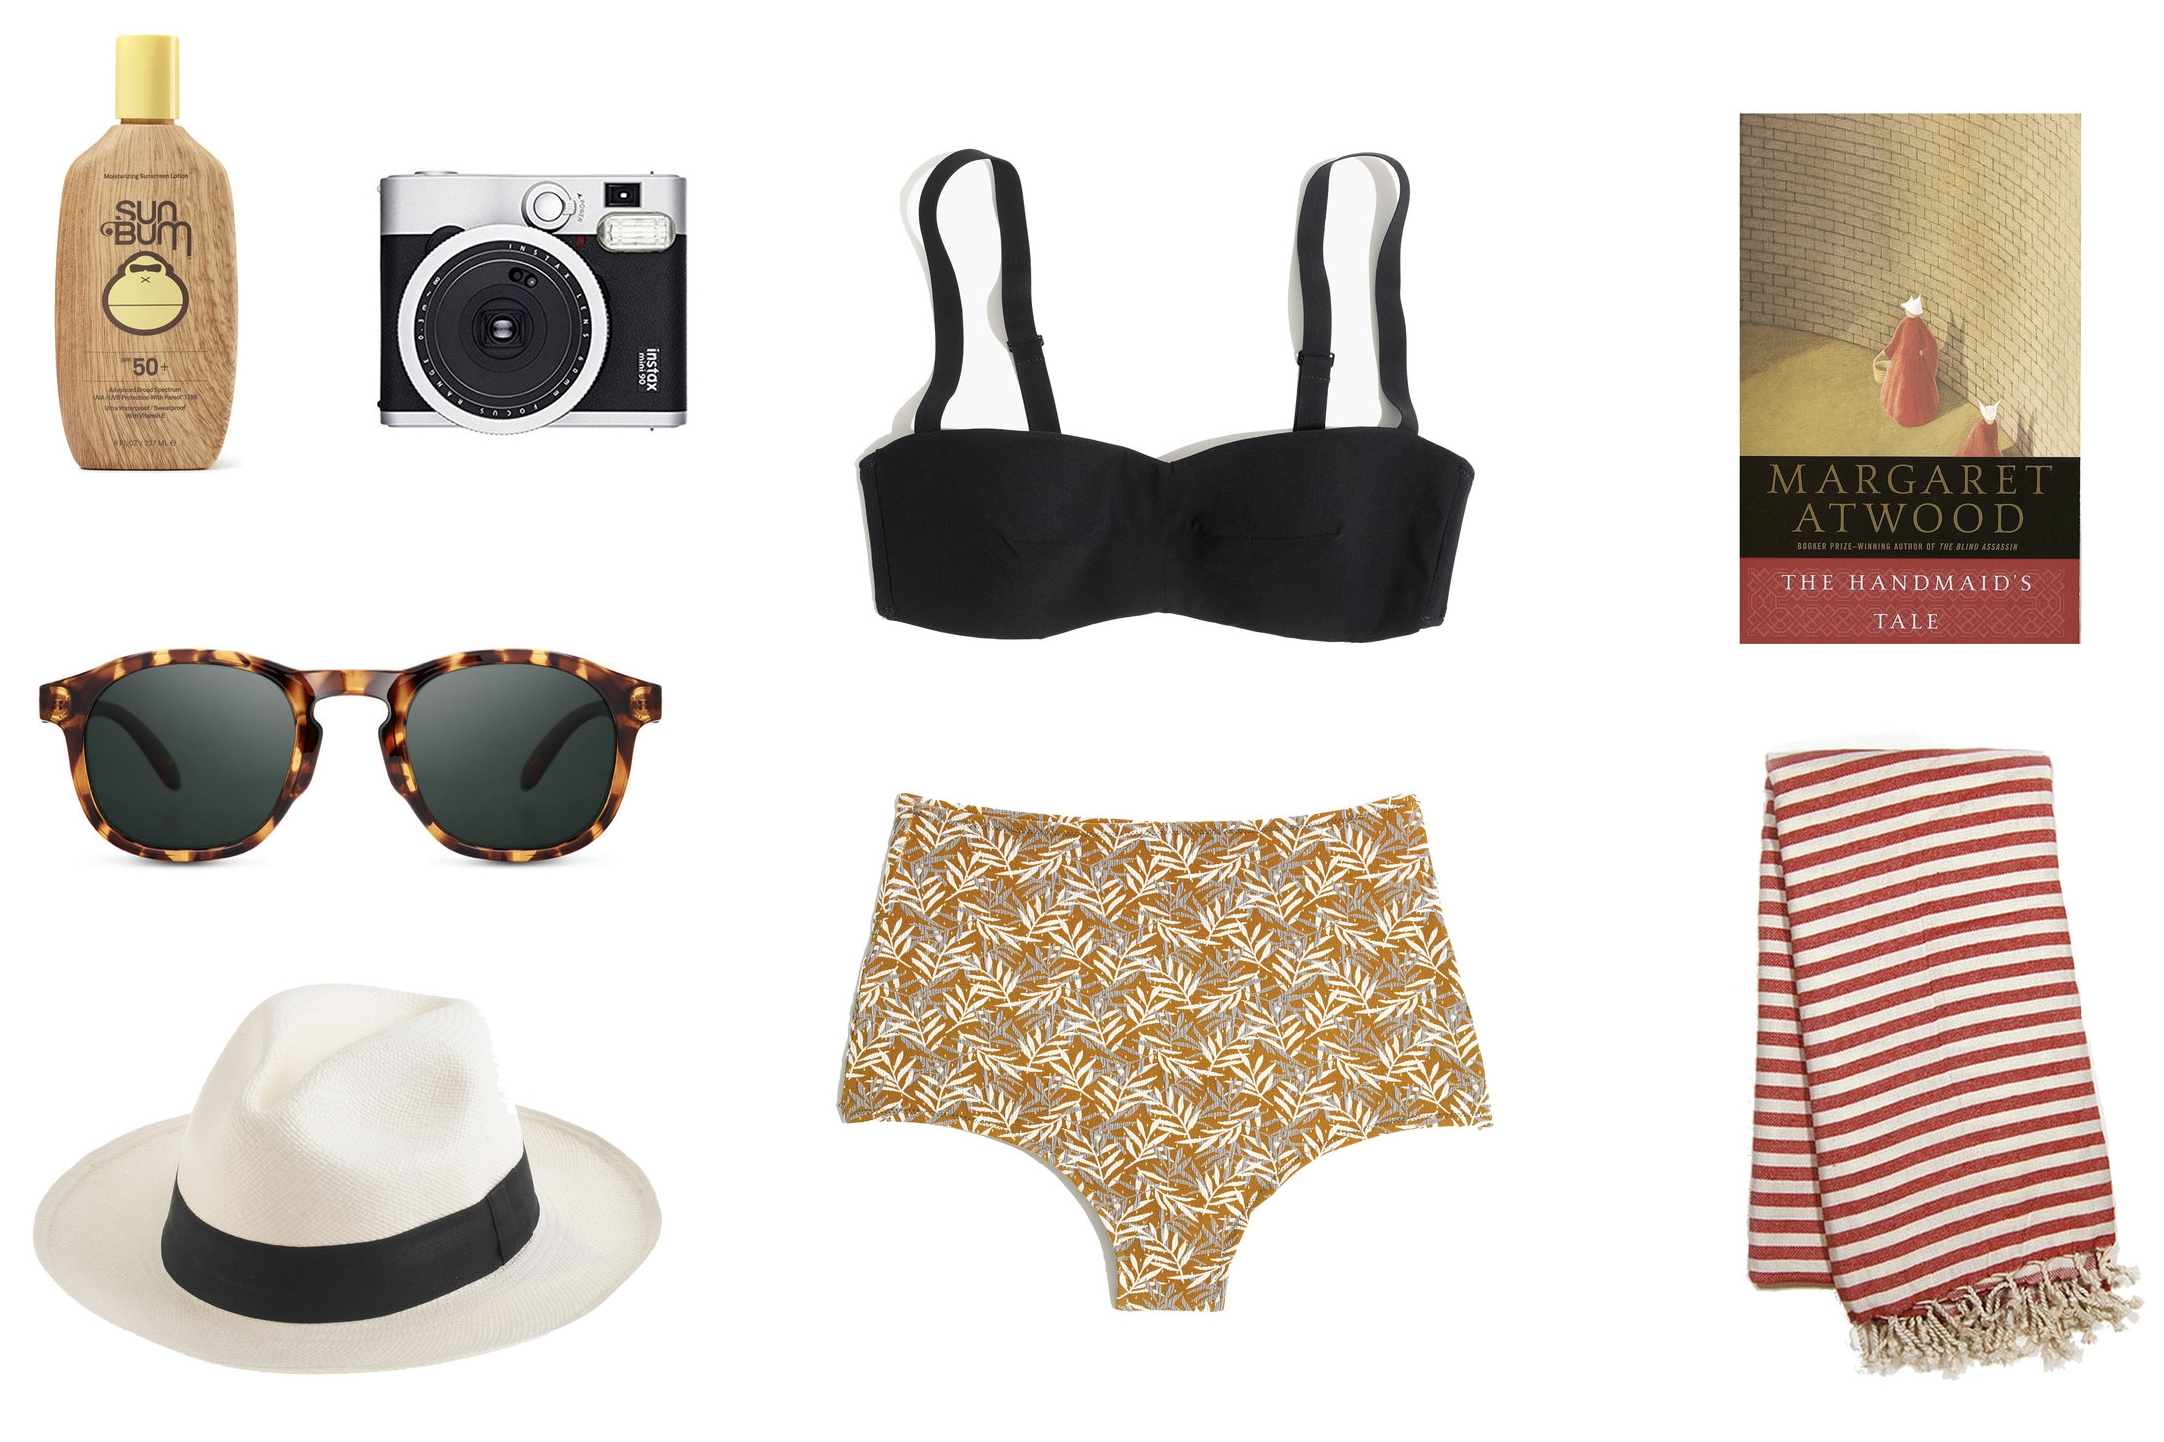 1)  Sun Bum SPF 50 Original Sunscreen Lotion 2)  Fujifilm Instax Mini 90 Neo Classic in Black 3)  Bathing Suit  4)  The Handmaid's Tale by Margaret Atwood 5)  Sunski Foothill Sunglasses  6)  Panama Hat  7) Turkish Beach Towel